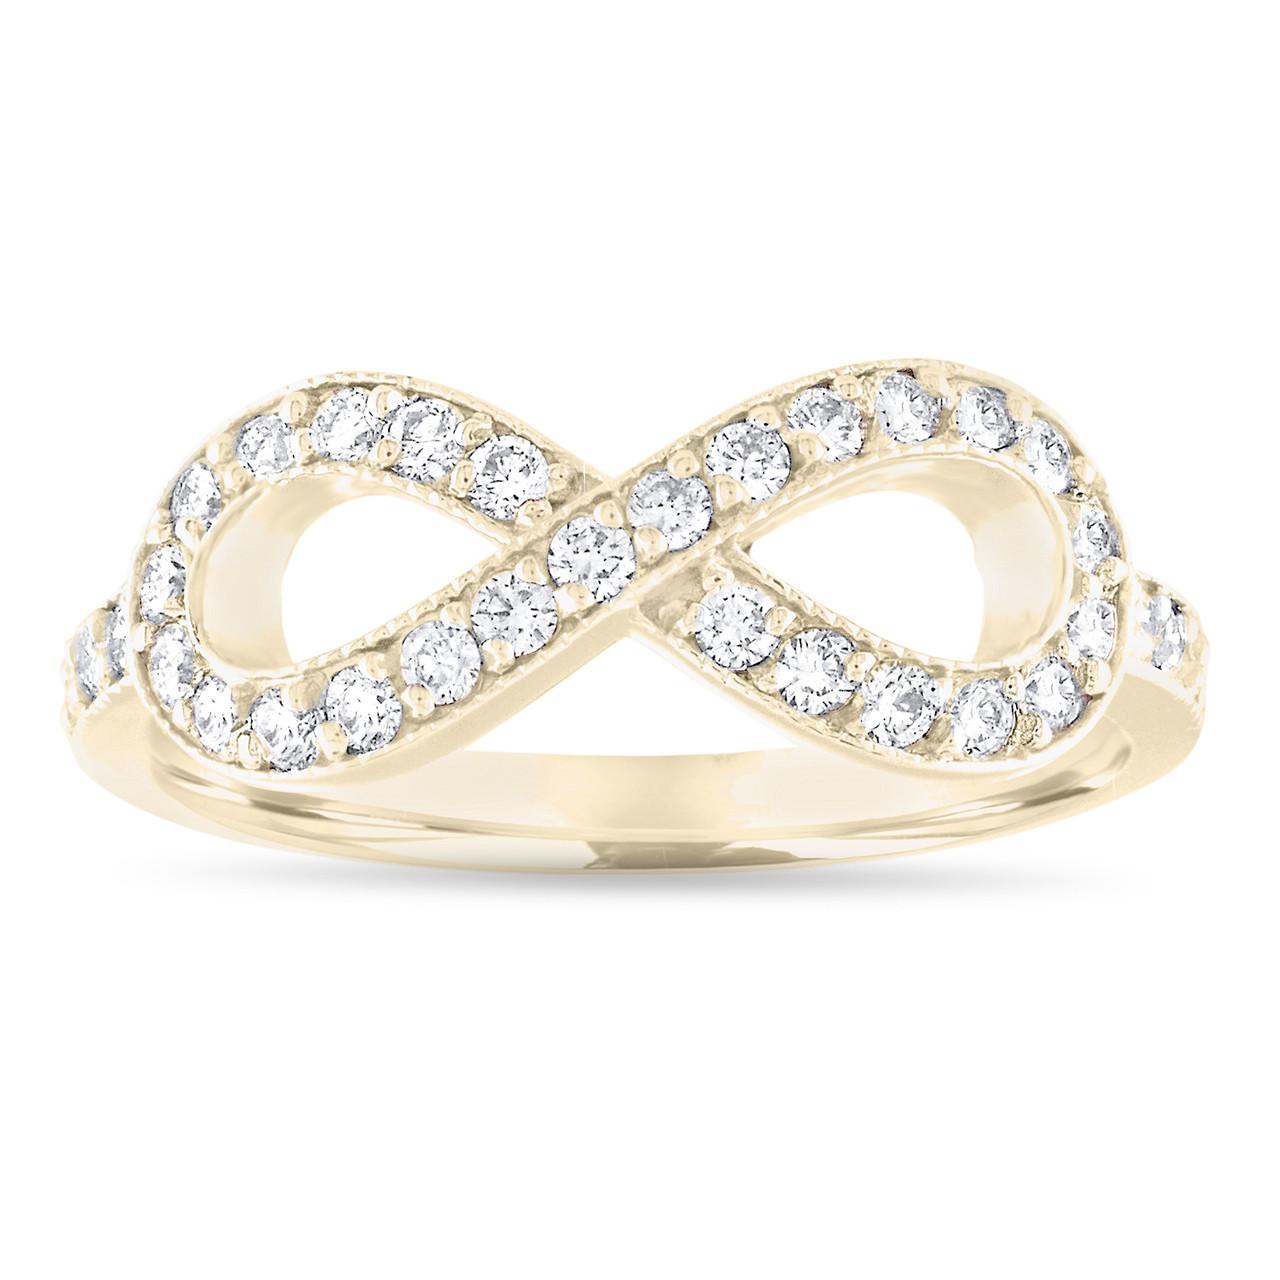 Antique Style 4 2mm Platinum Men S Wedding Band With: Diamond Infinity Wedding Band, Yellow Gold Wedding Ring